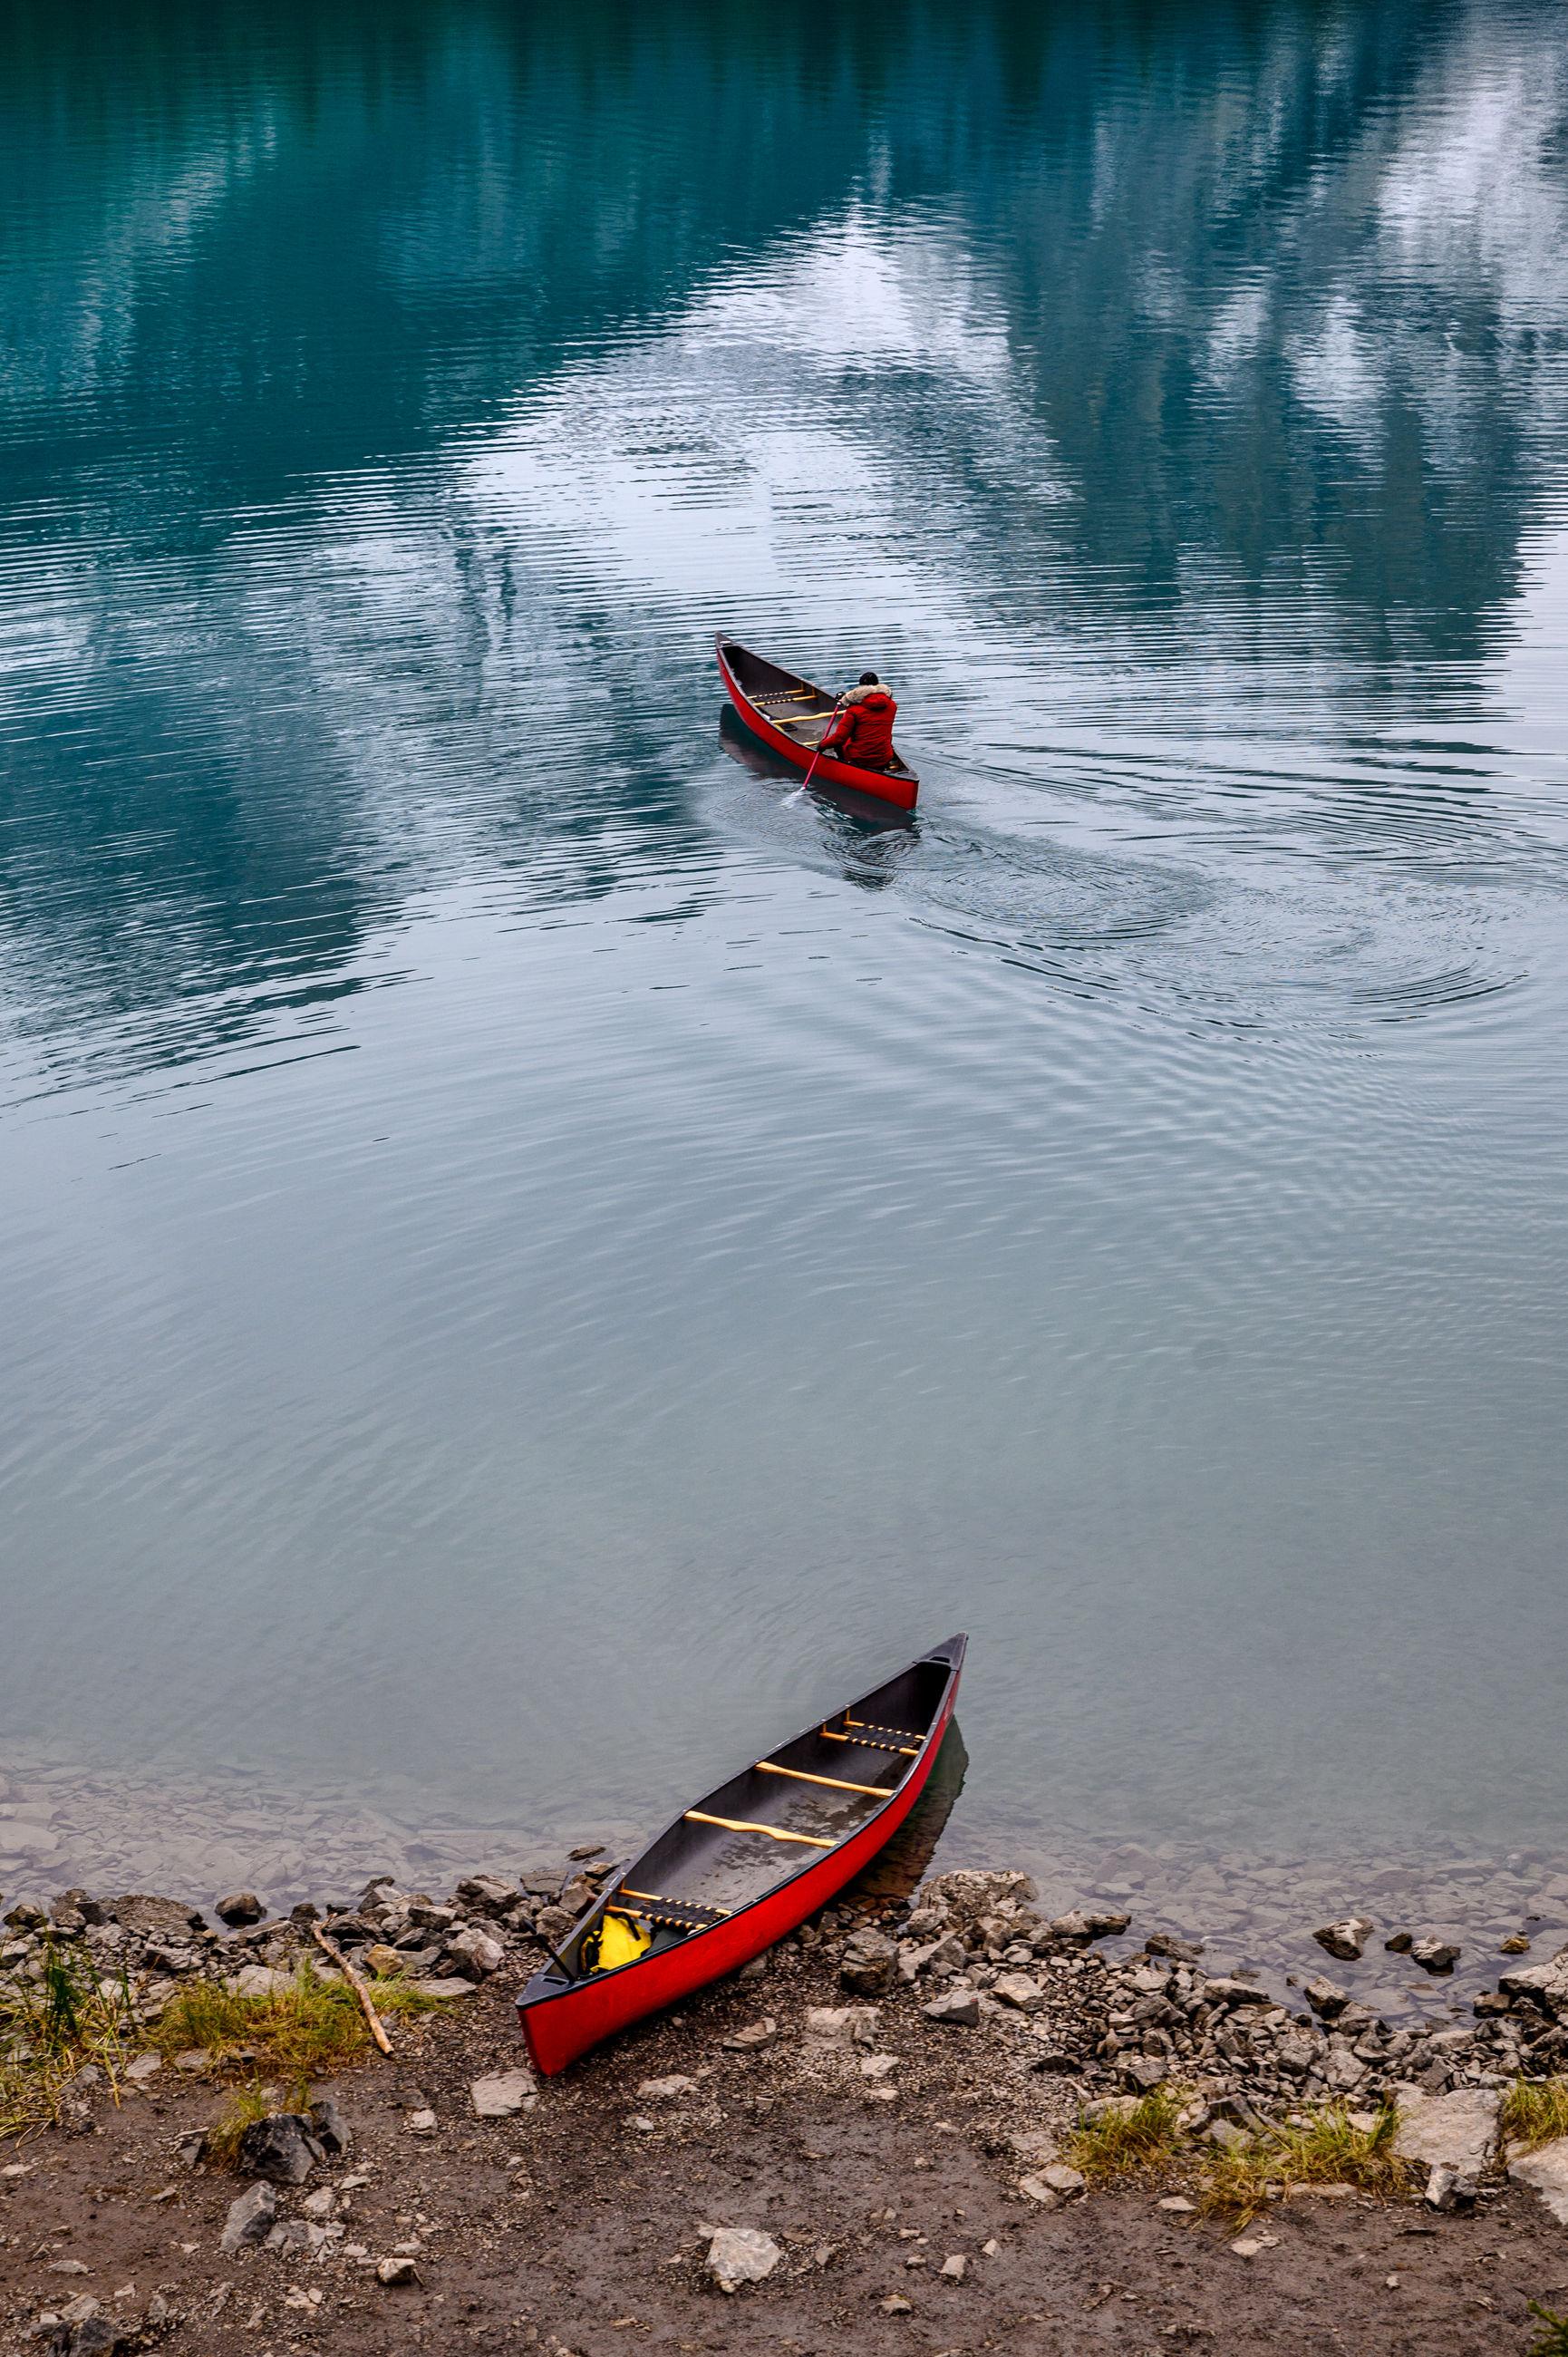 HIGH ANGLE VIEW OF MEN ON BOAT AT LAKE